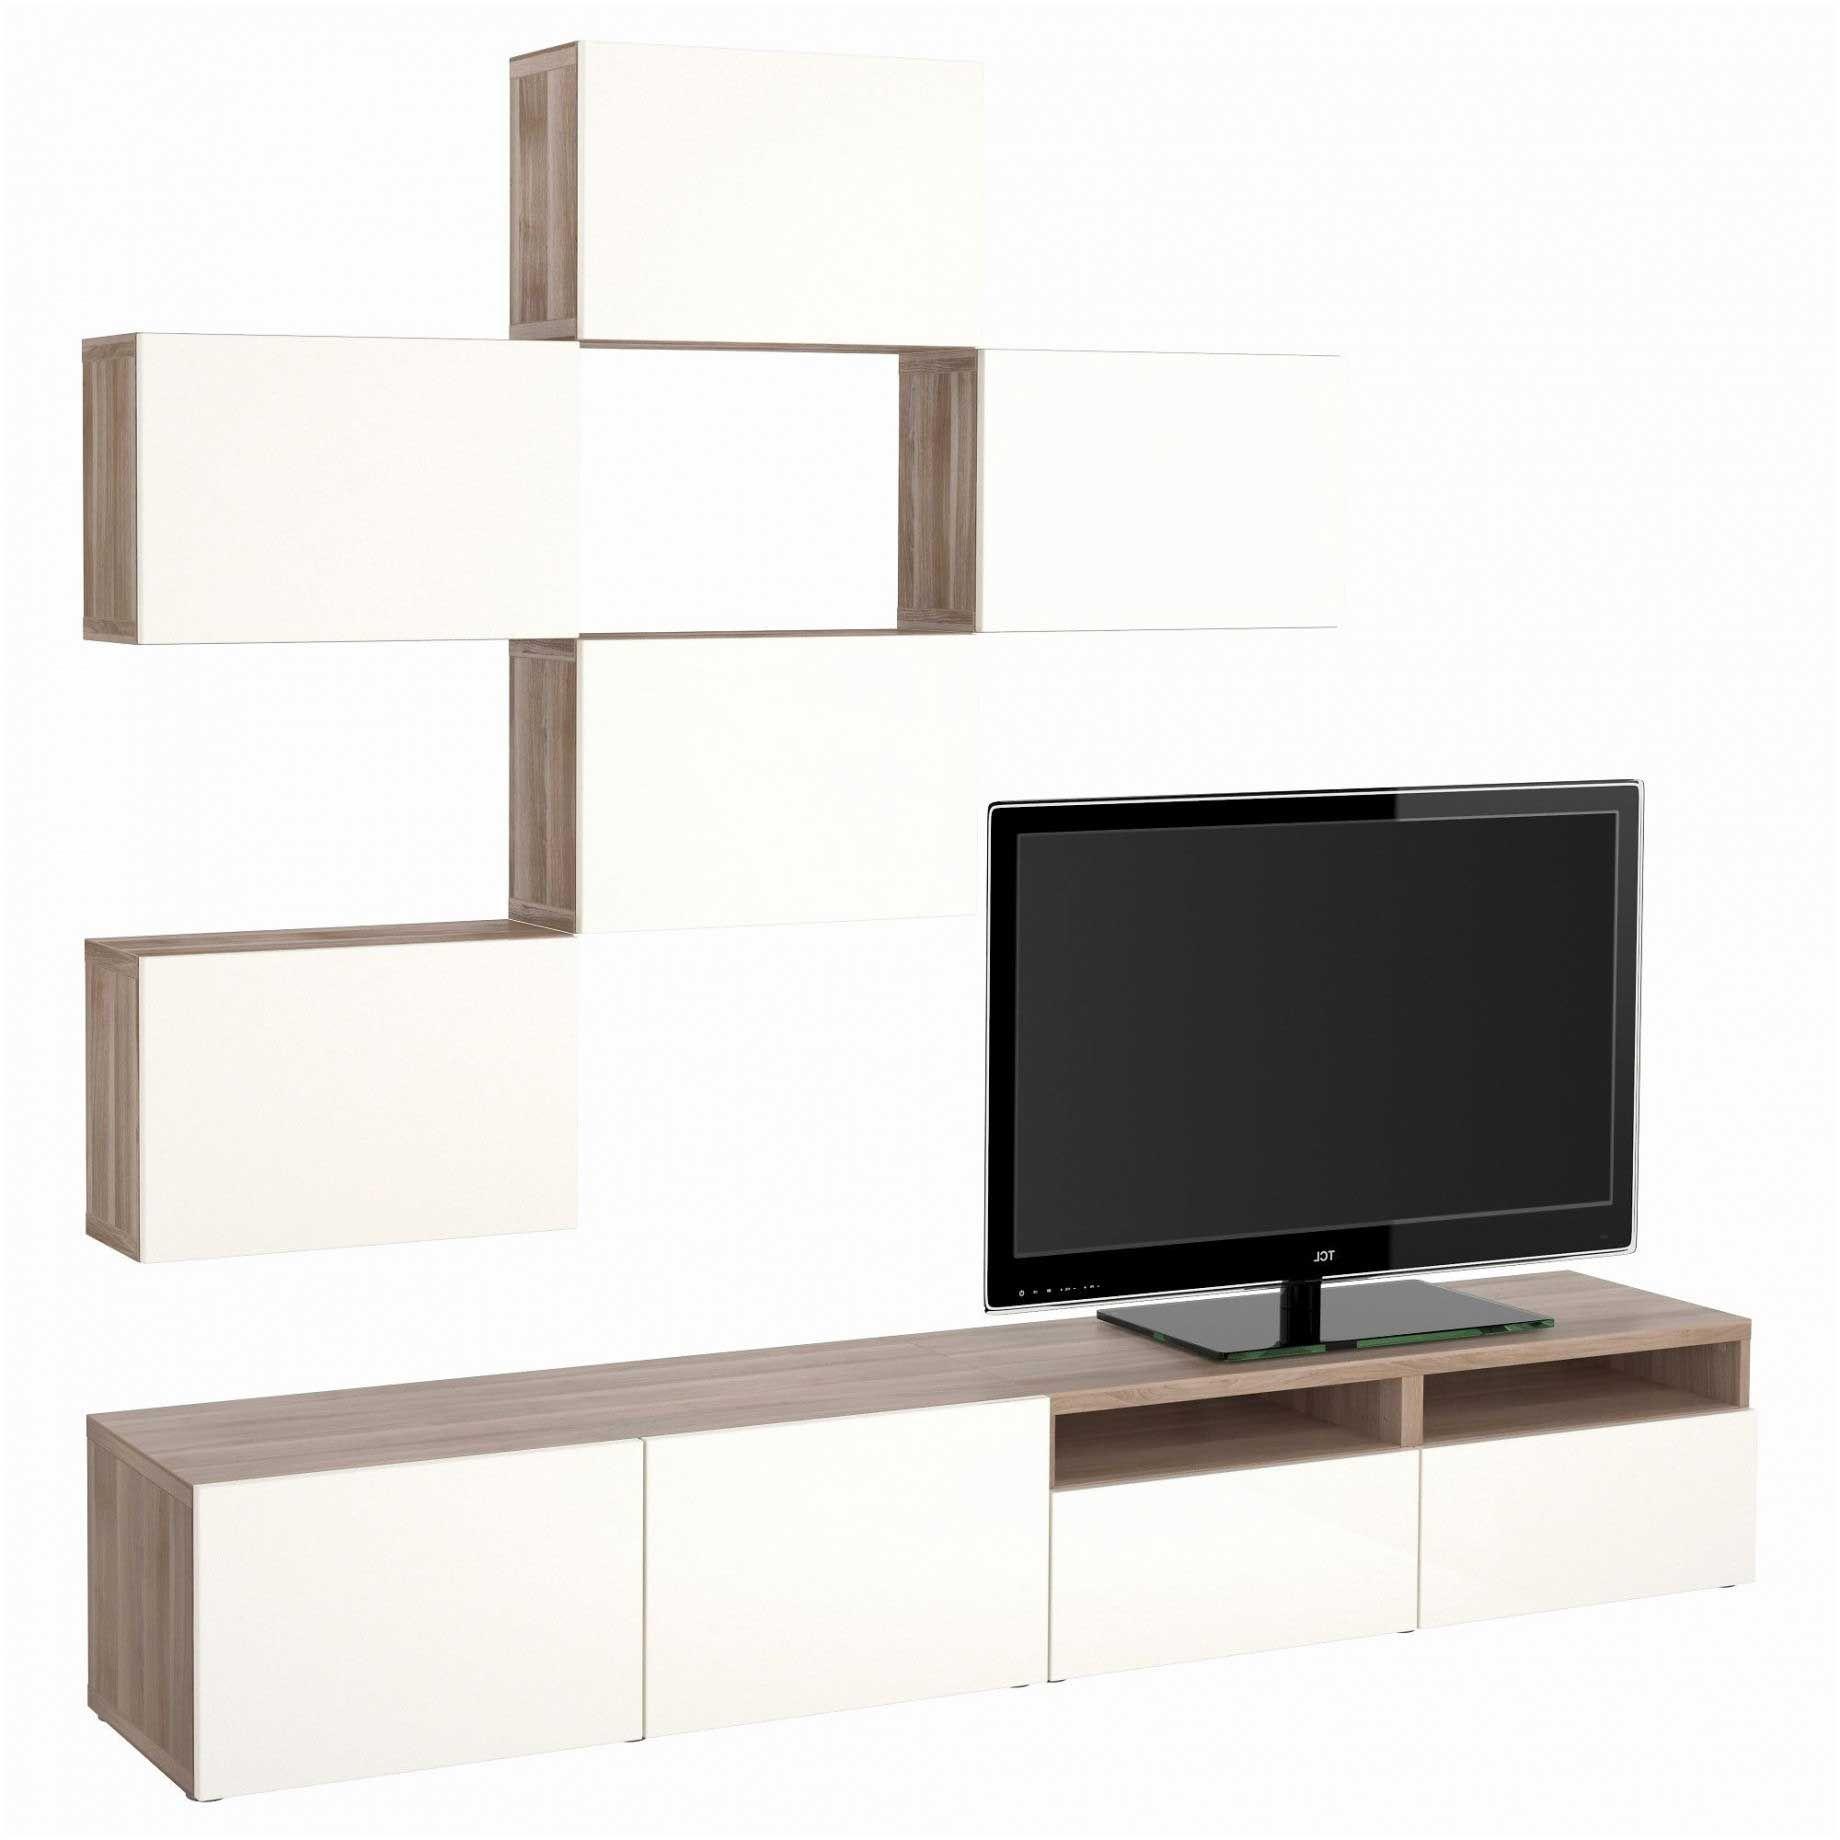 Ensemble Table Basse Et Meuble Tv Table Basse Et Meuble Tv